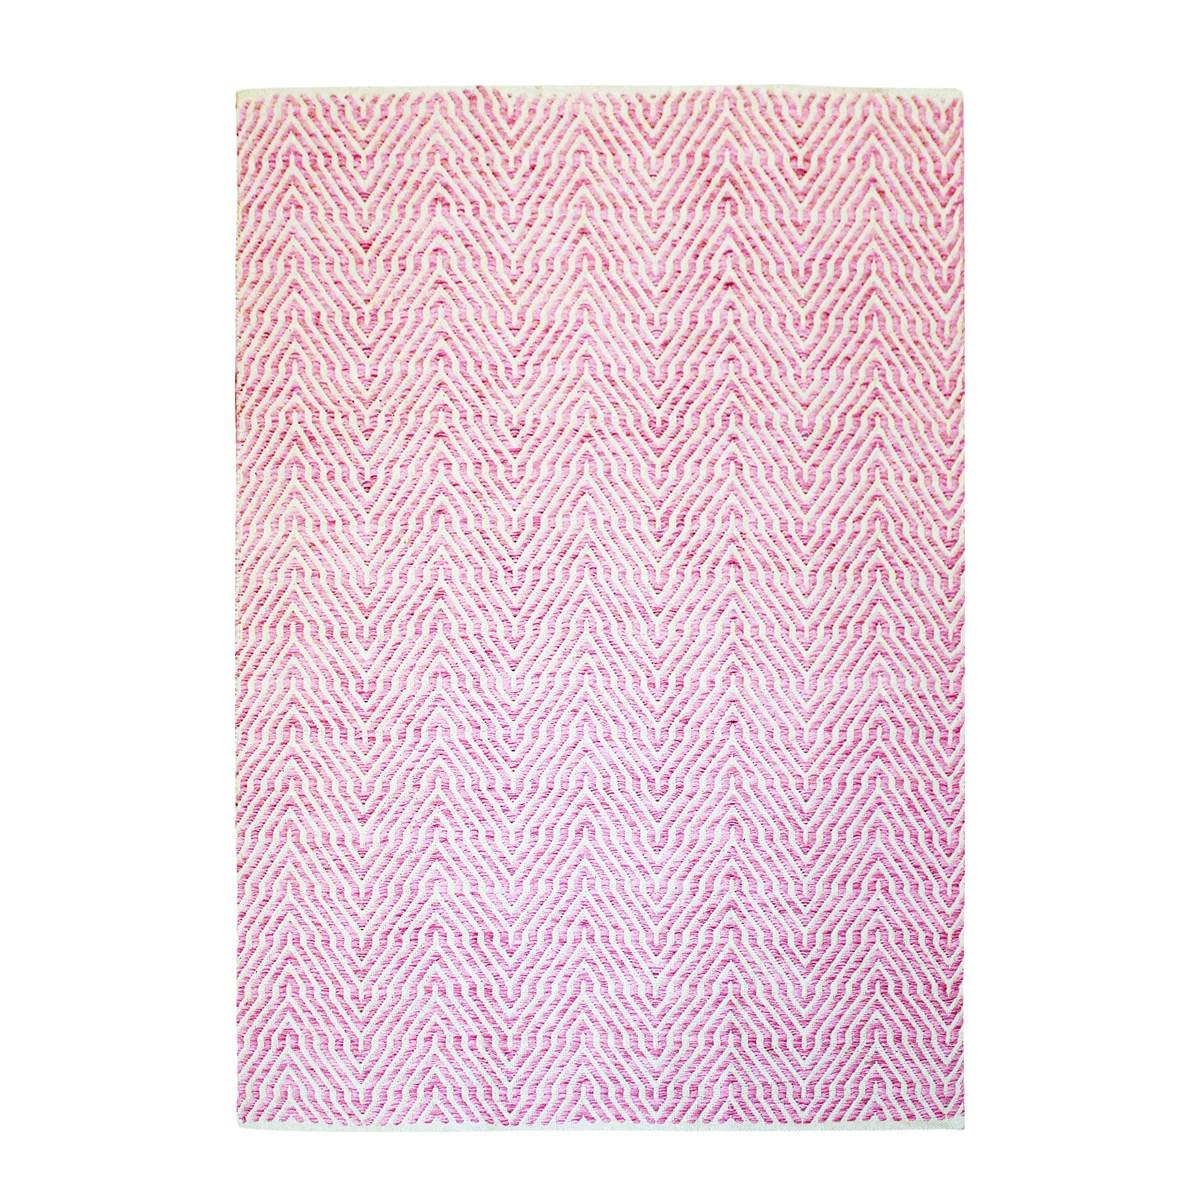 Tapis design en Coton Rose 80x150 cm